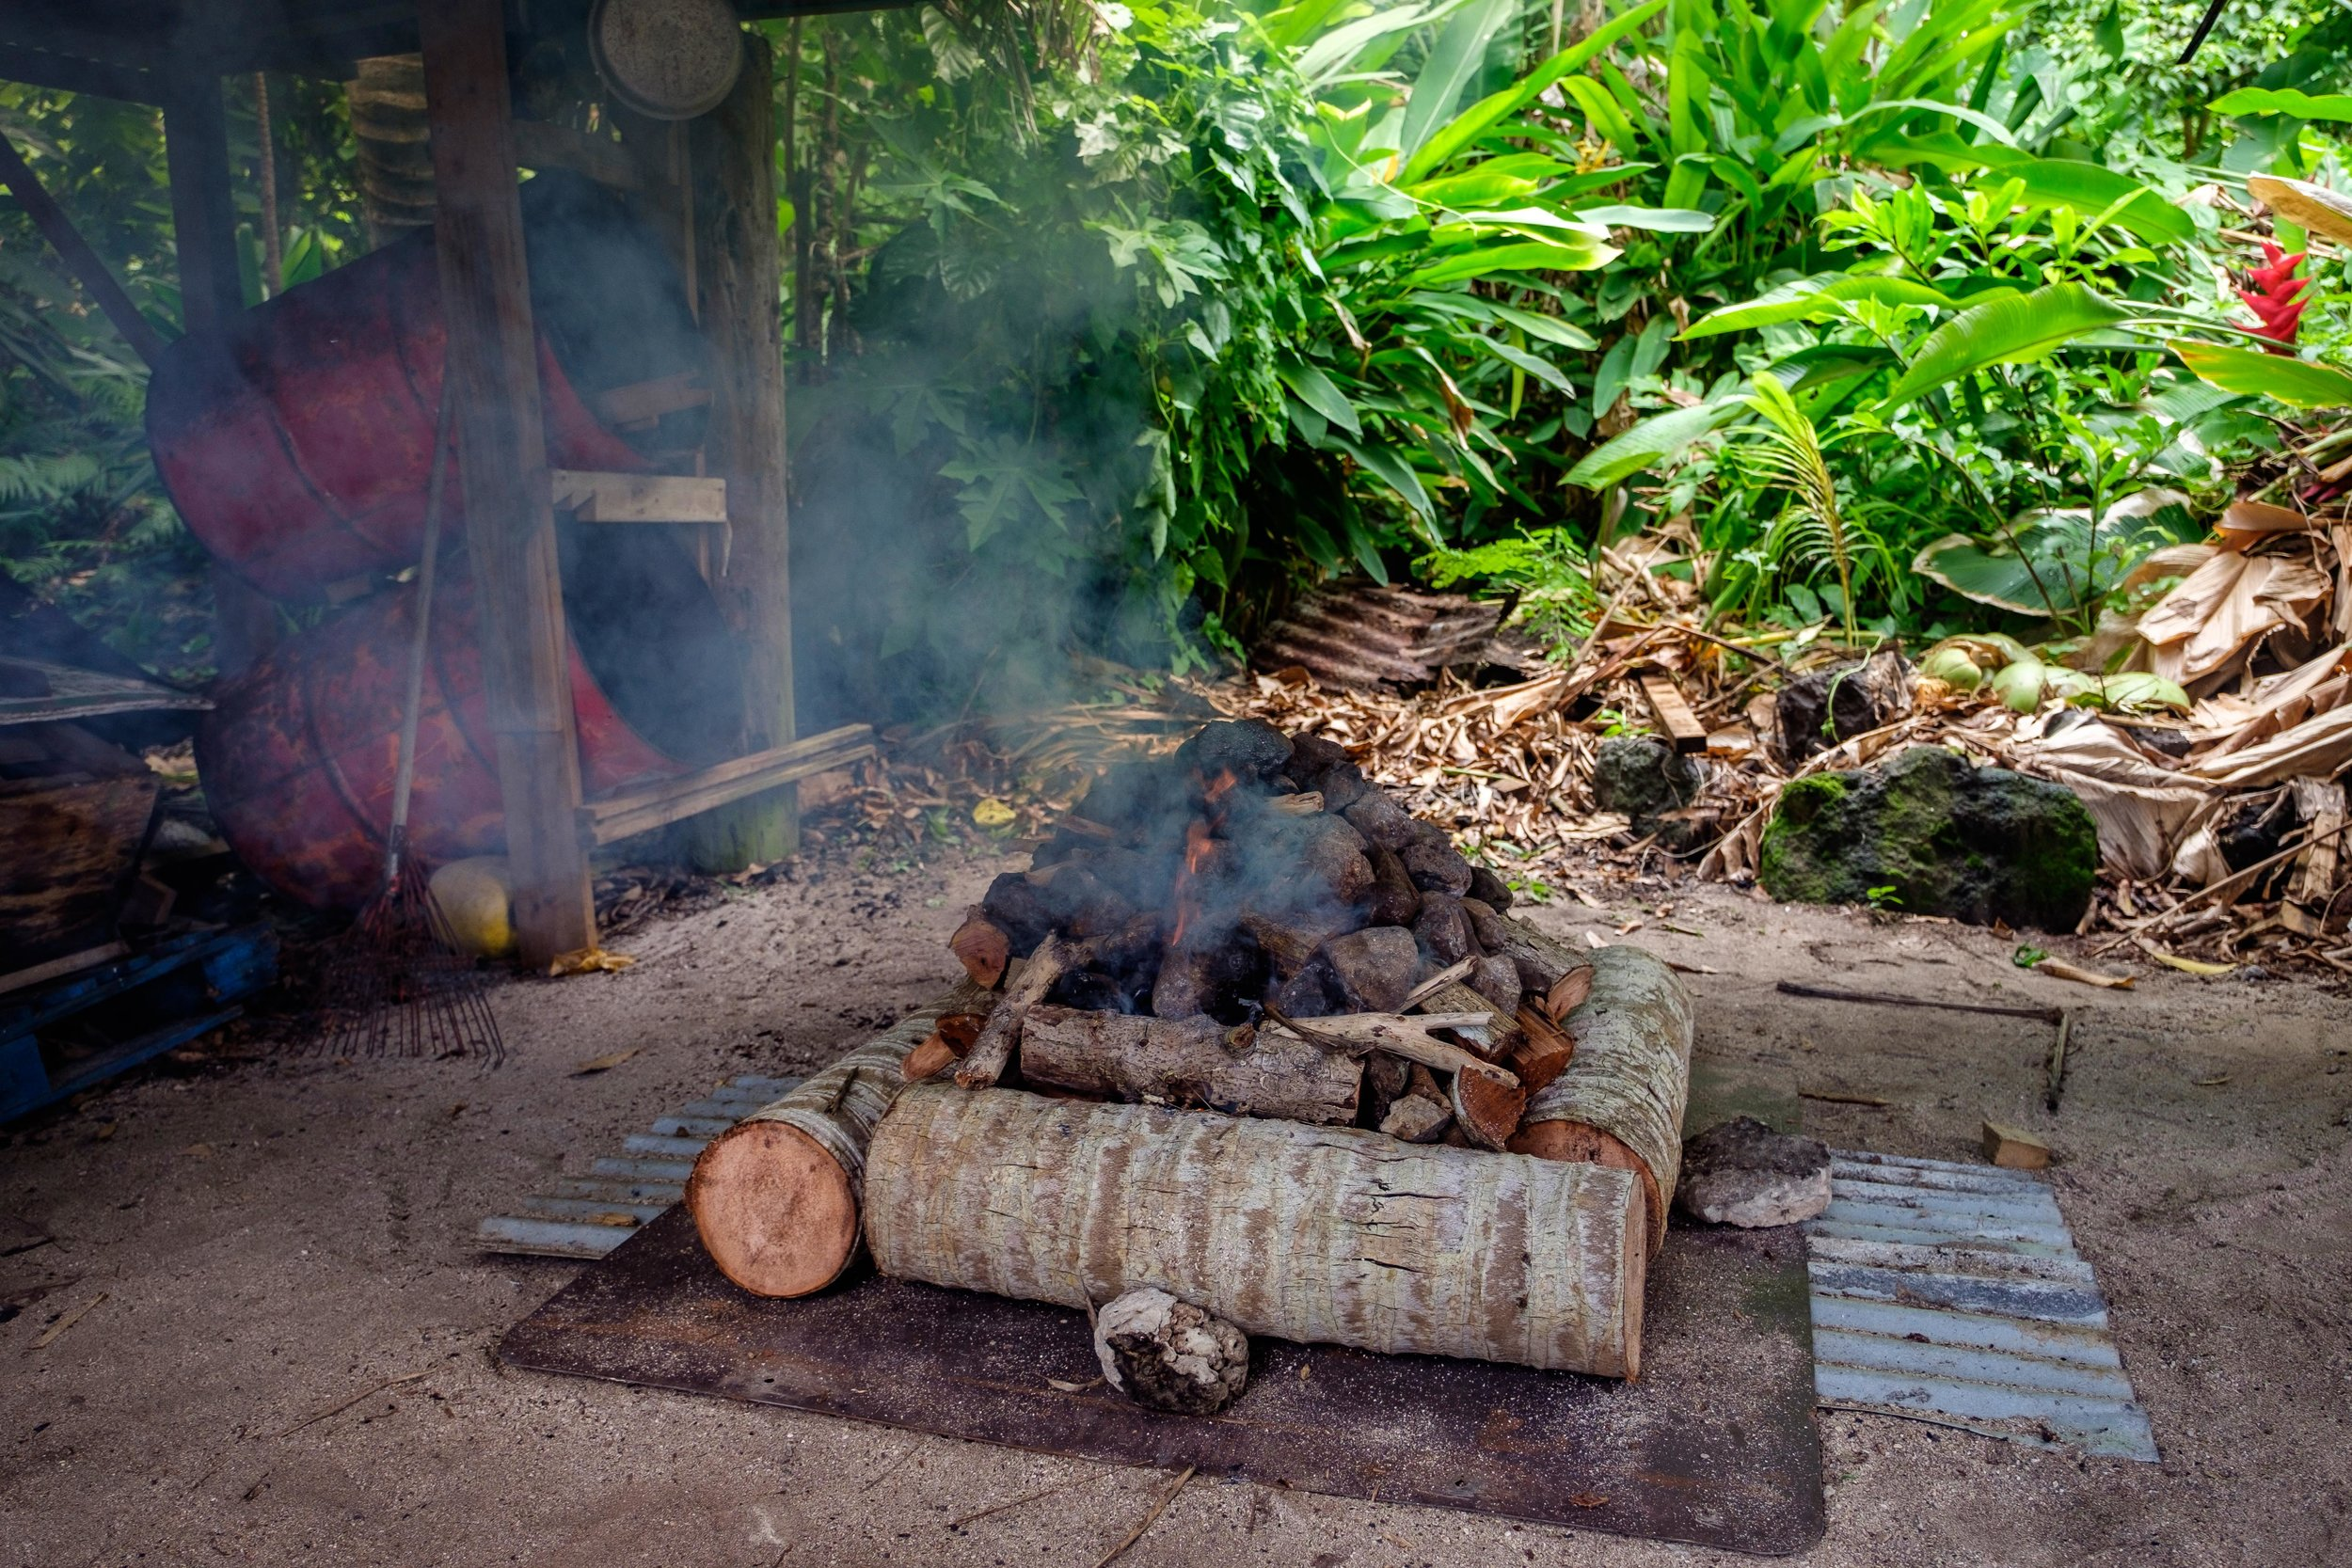 20161214-JI-American Samoa National Park-_DSF1605.jpg